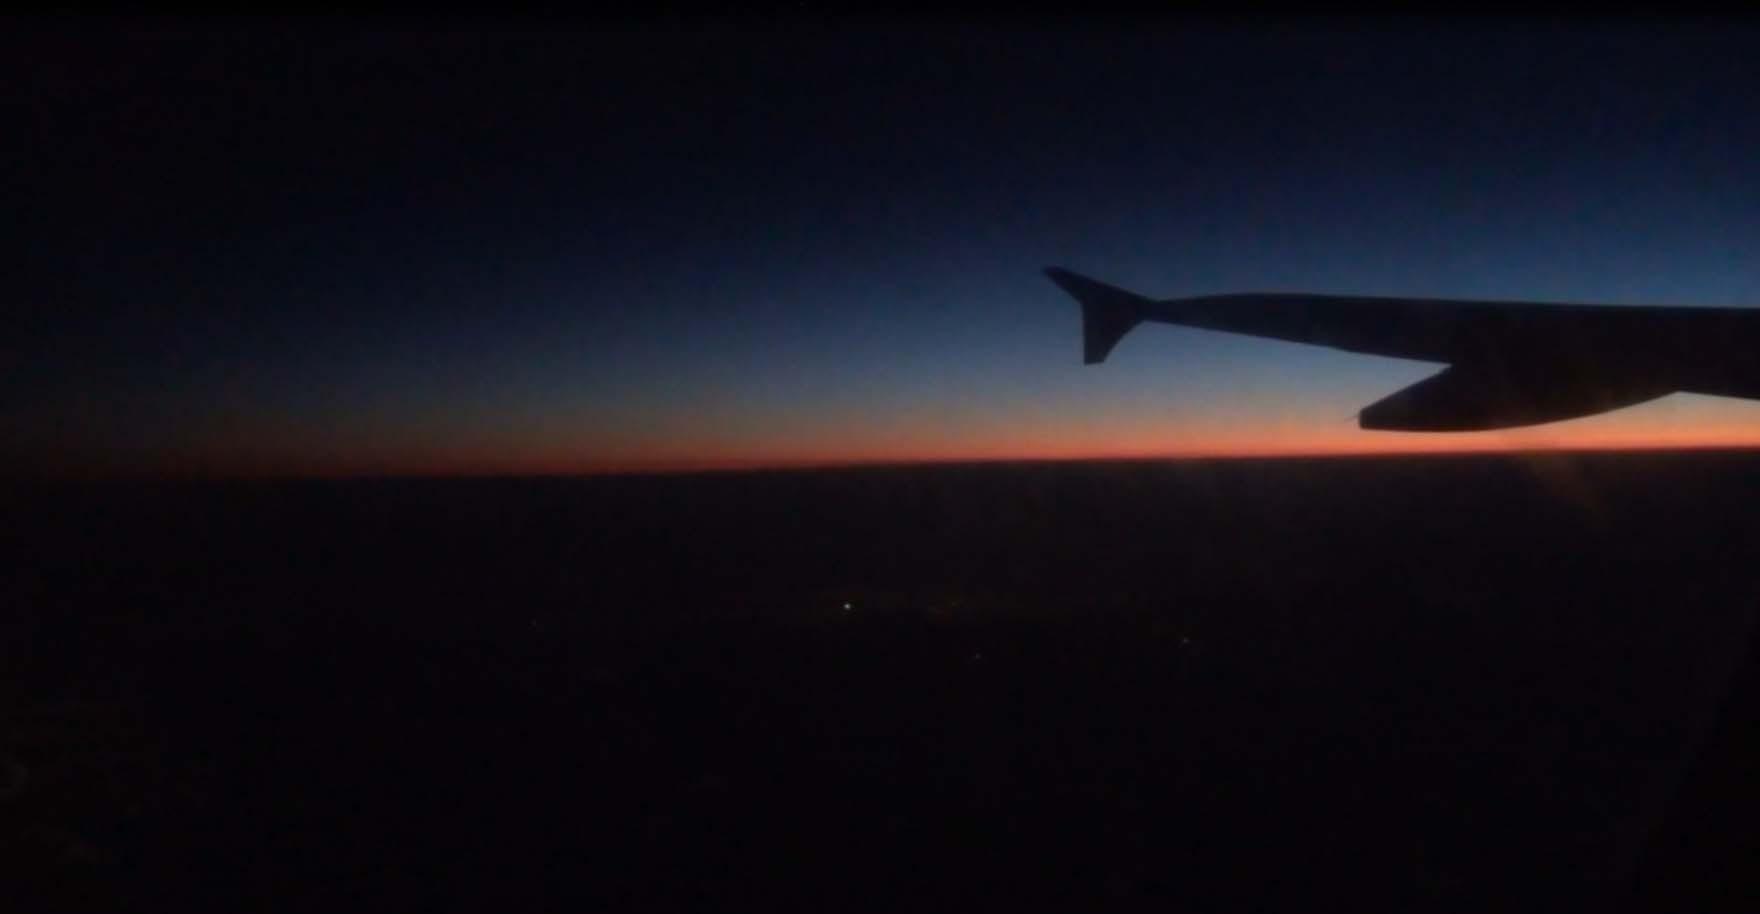 Рассвет над облаками, фото Игоря Чувакина